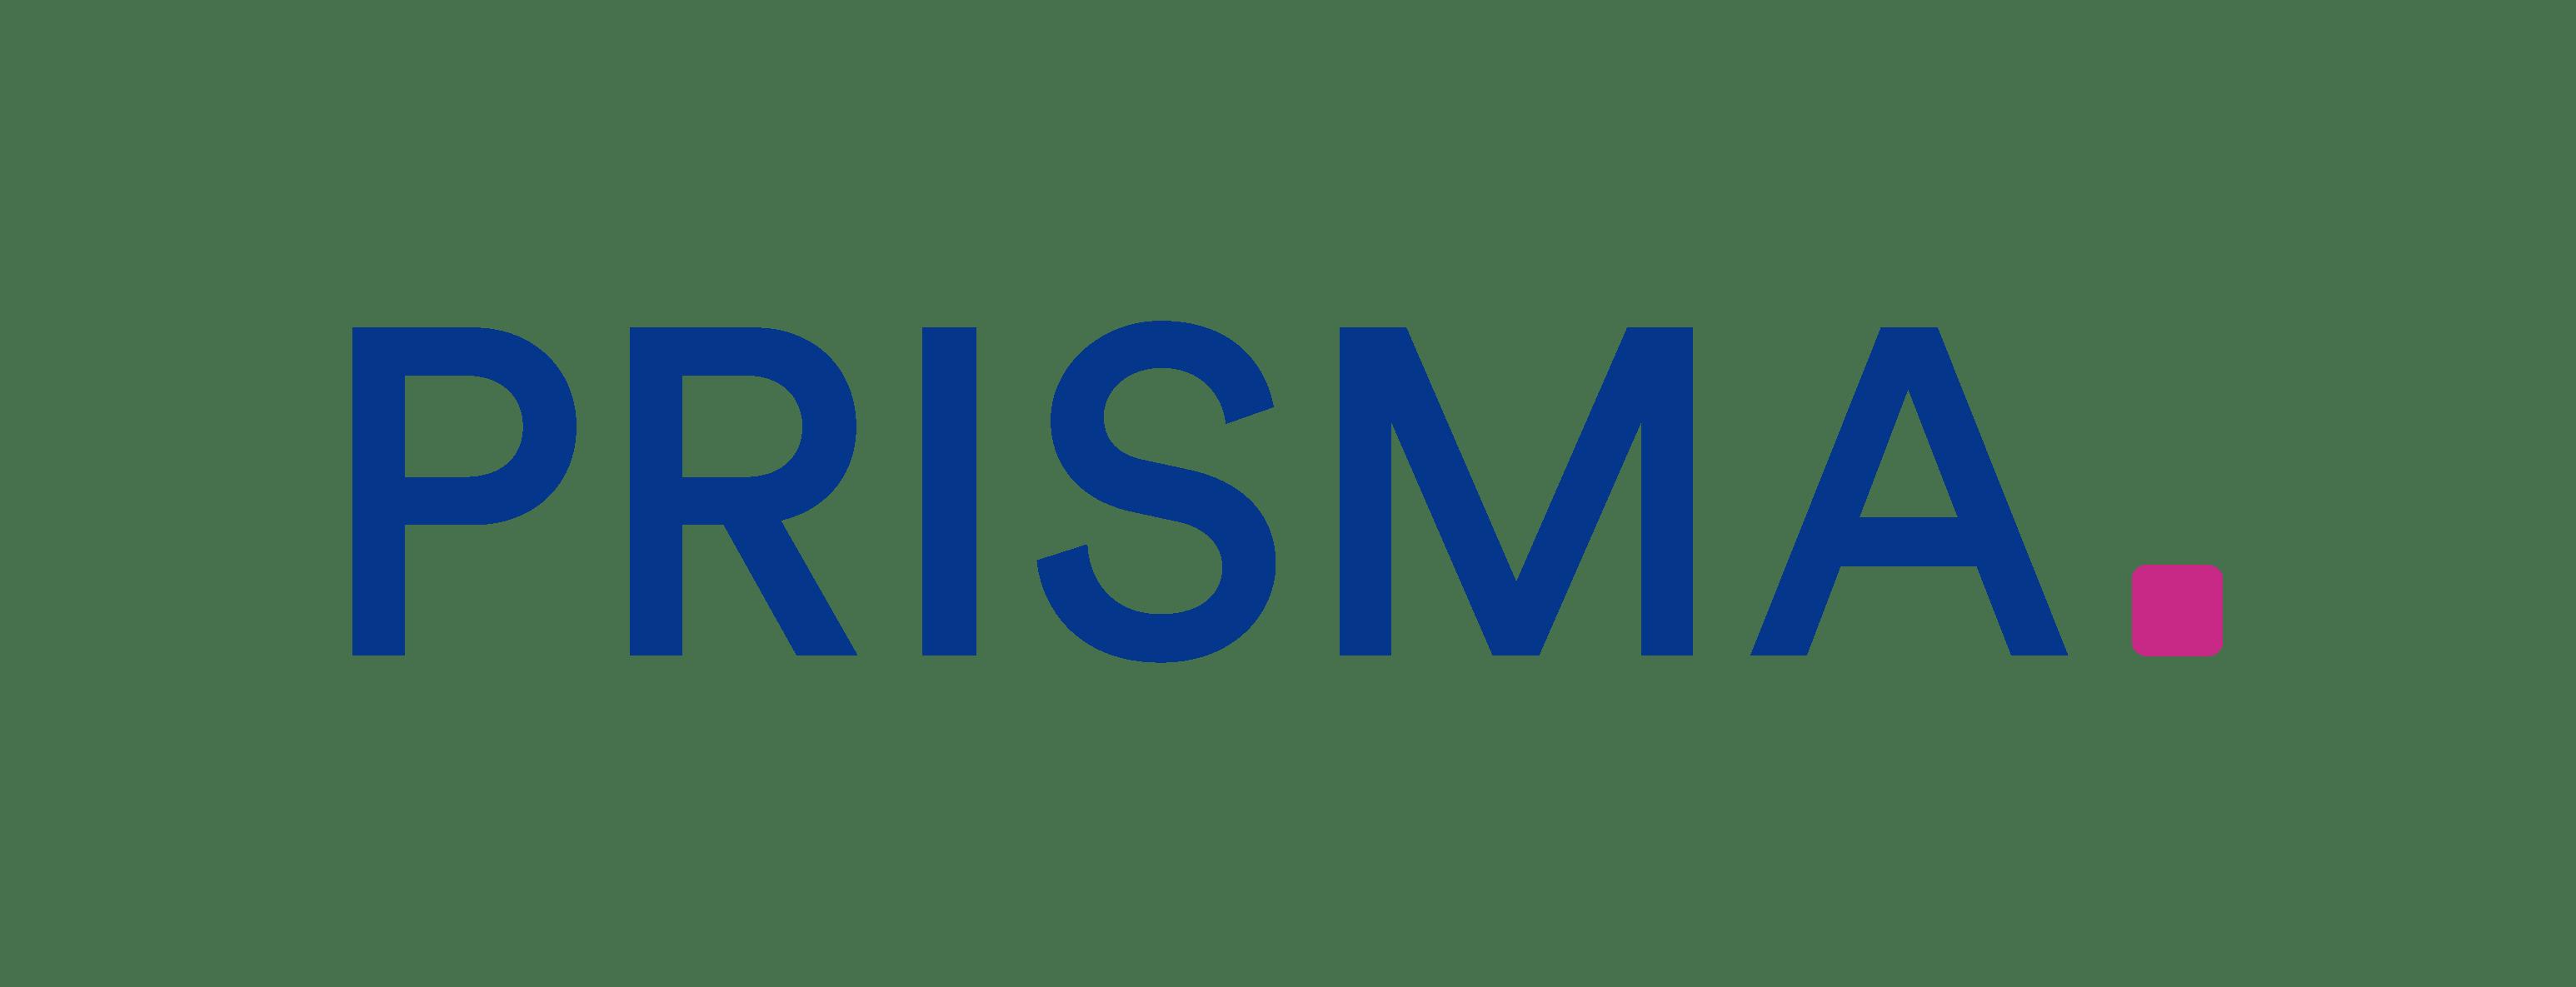 PRISMA_Logo_verkuerzt_farbig-1